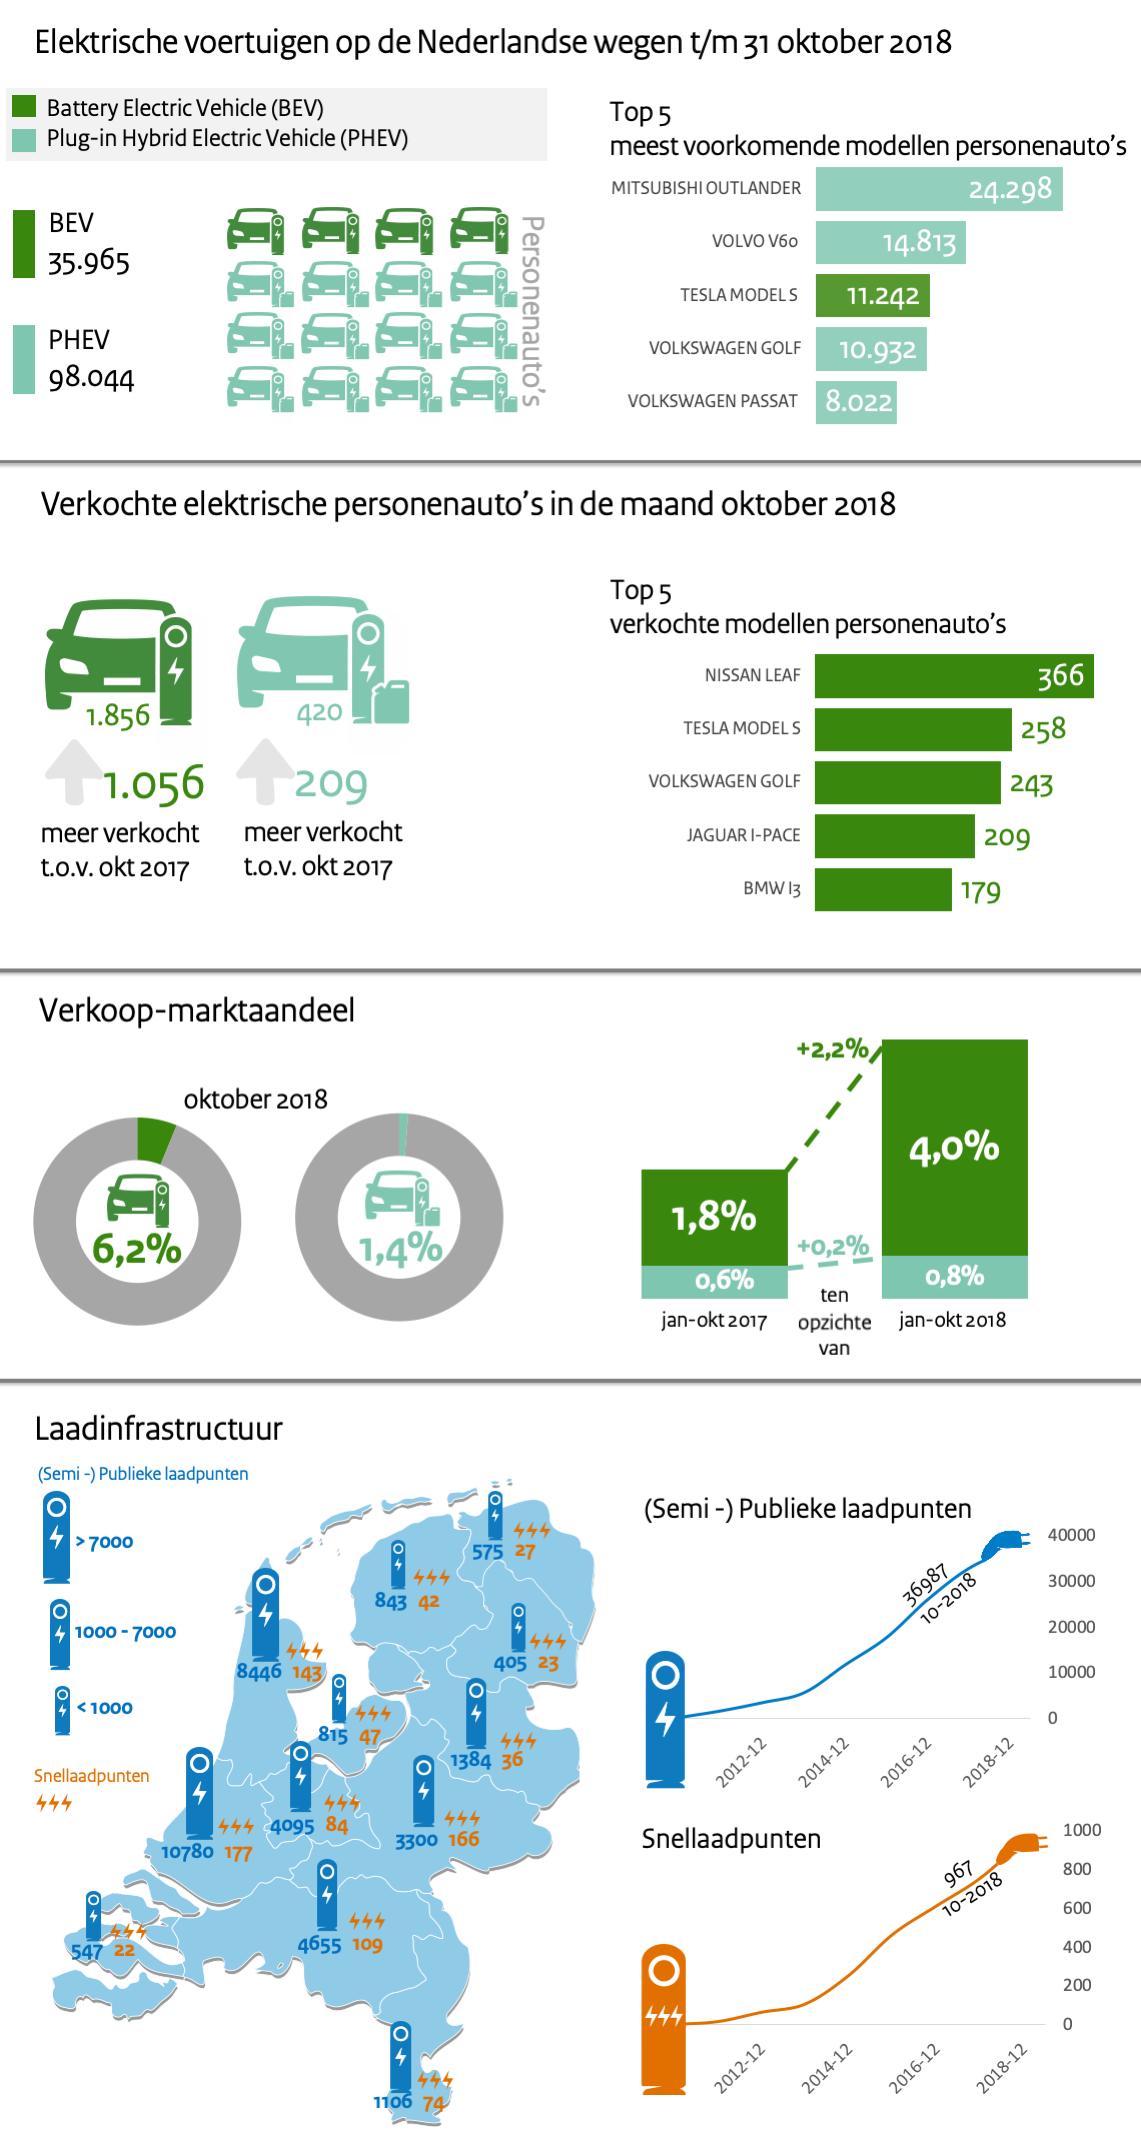 elektrisch vervoer nederland infographic oktober 2018